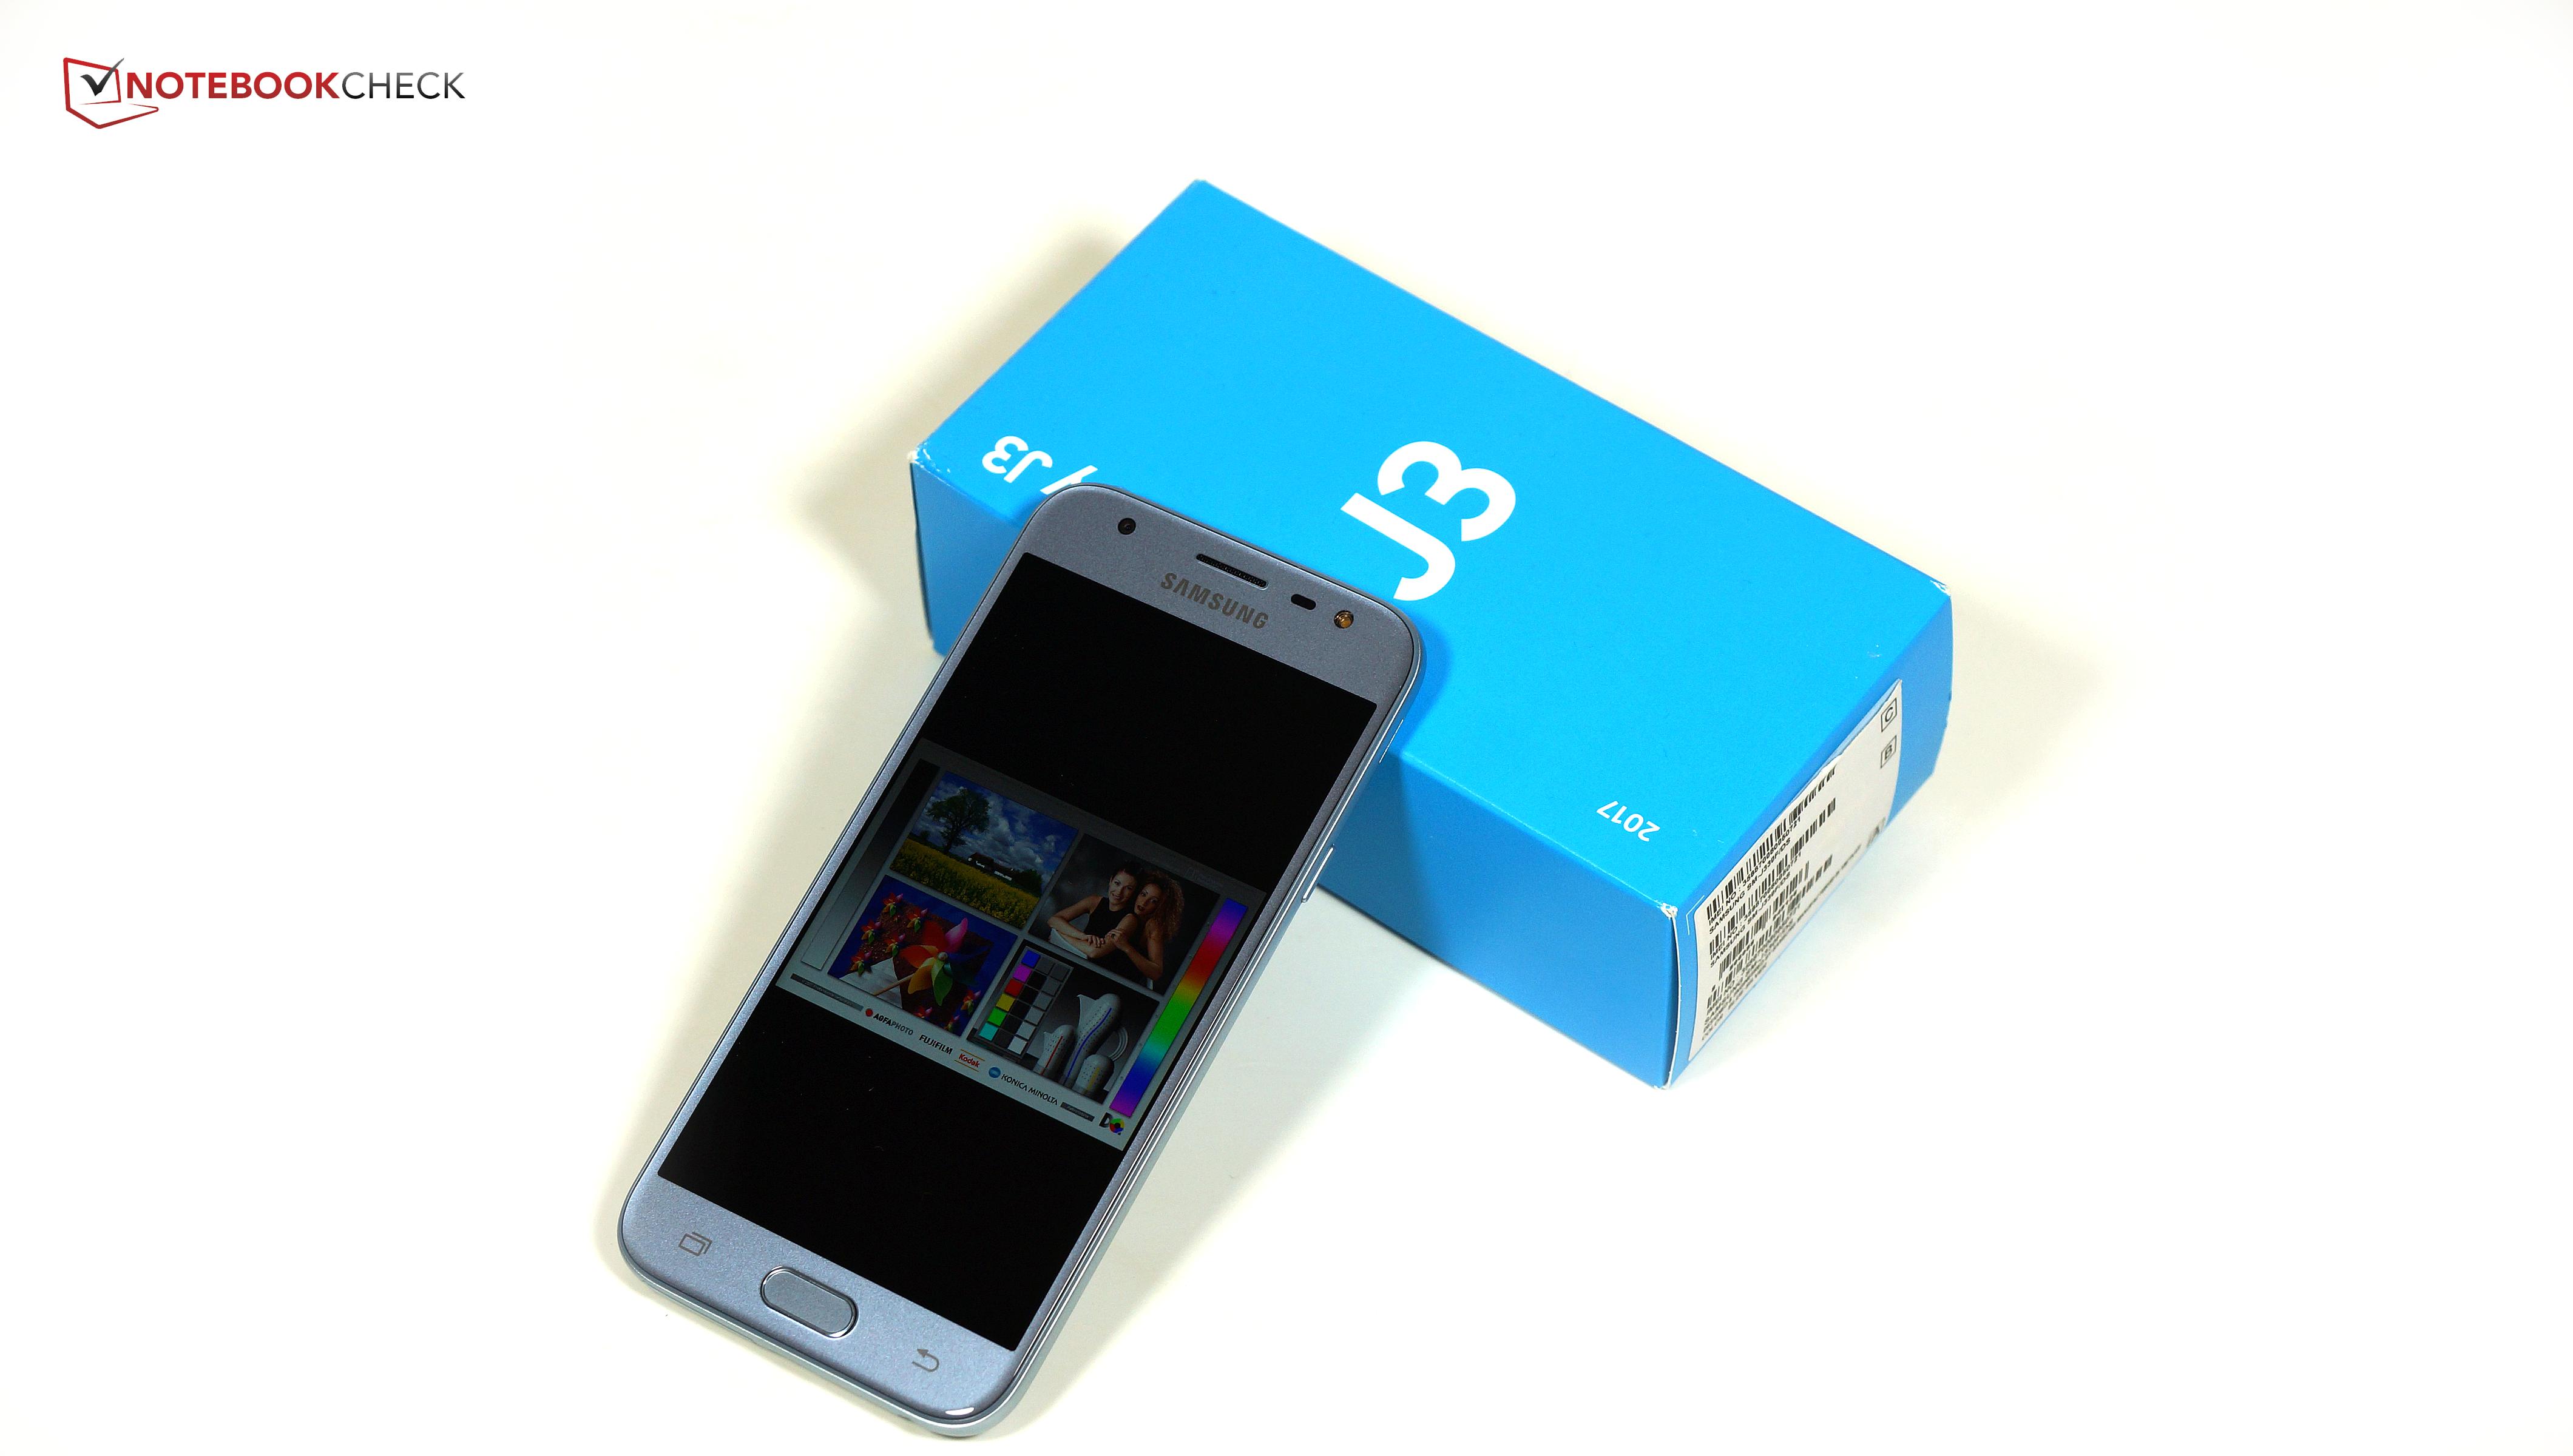 Samsung Galaxy J3 2017 Smartphone Review Reviews Log On Otg Micro Usb Lo 28 Gold Full Resolution